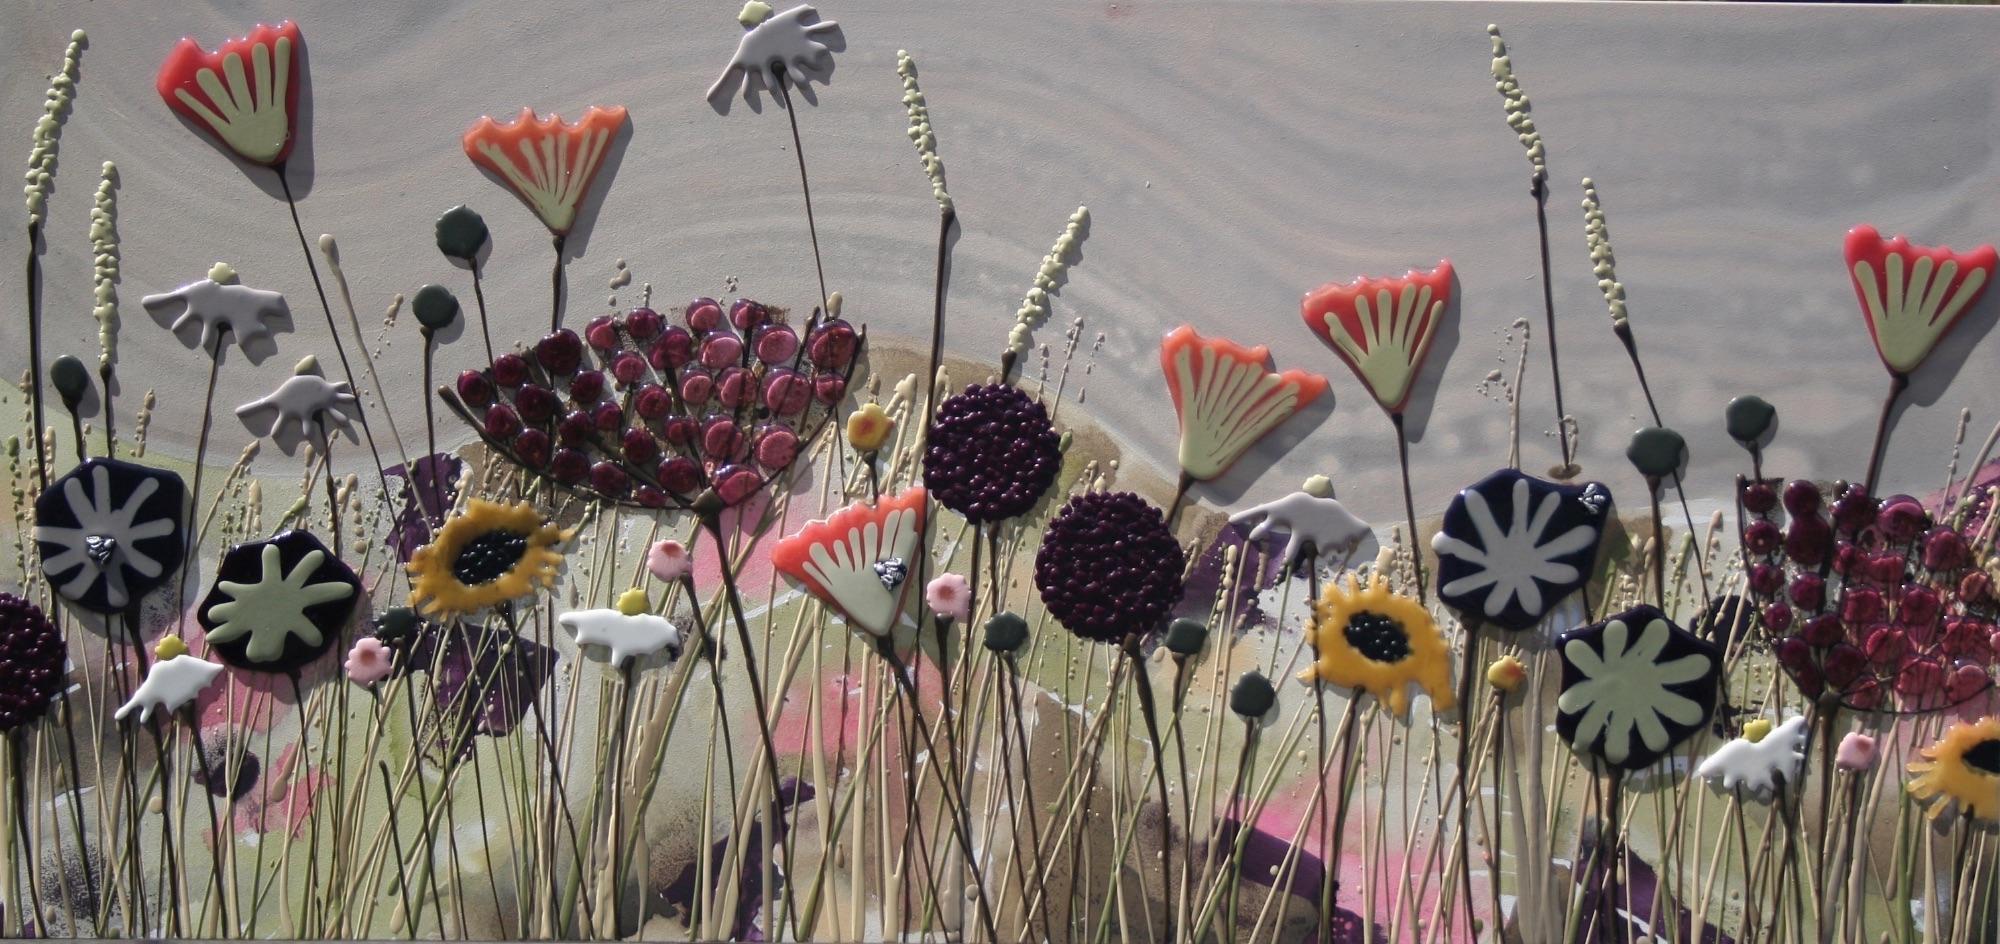 Lush Meadow - 120cm x 57cm